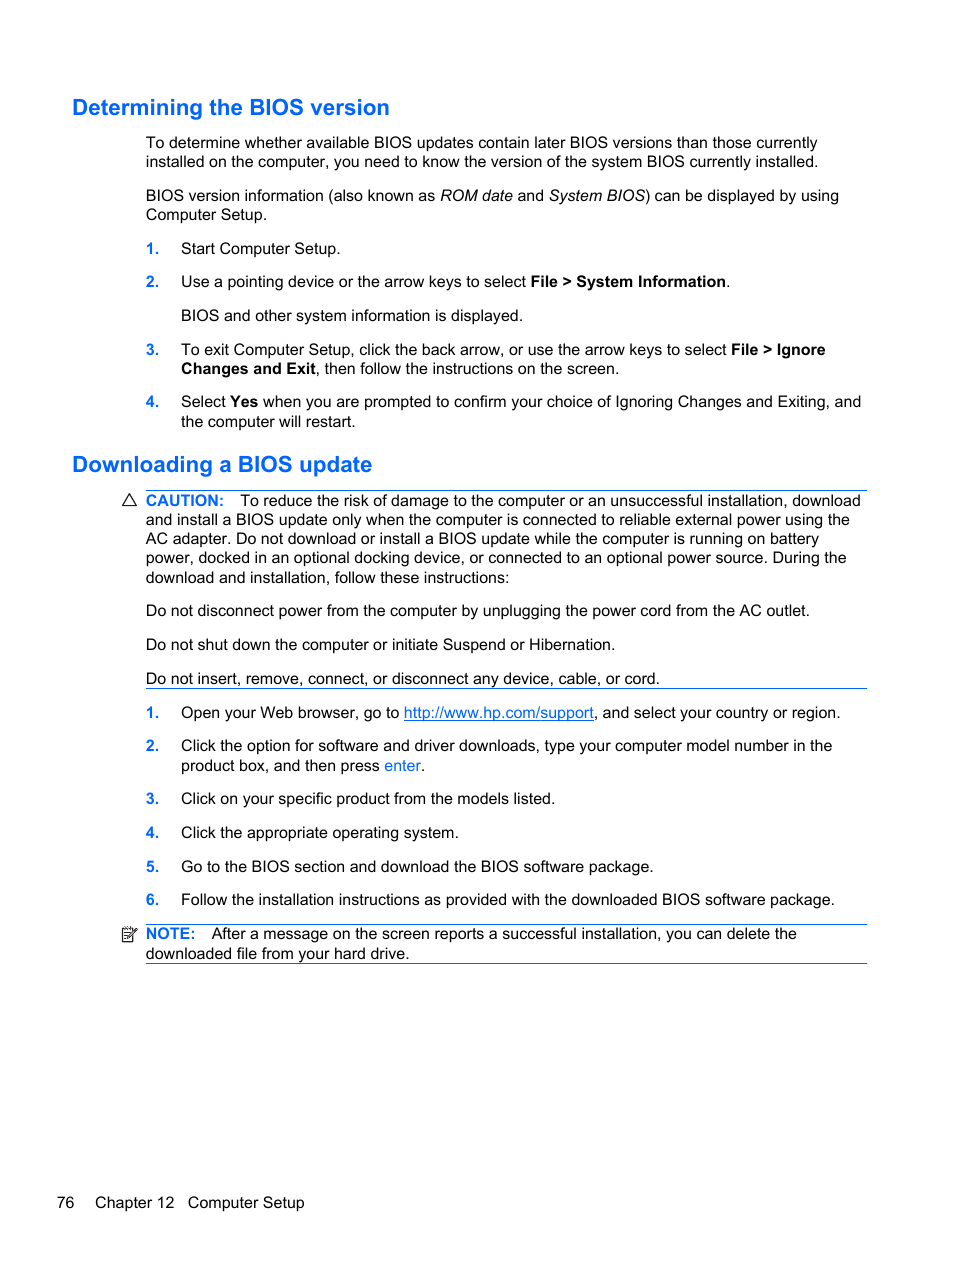 Determining the bios version, Downloading a bios update | HP